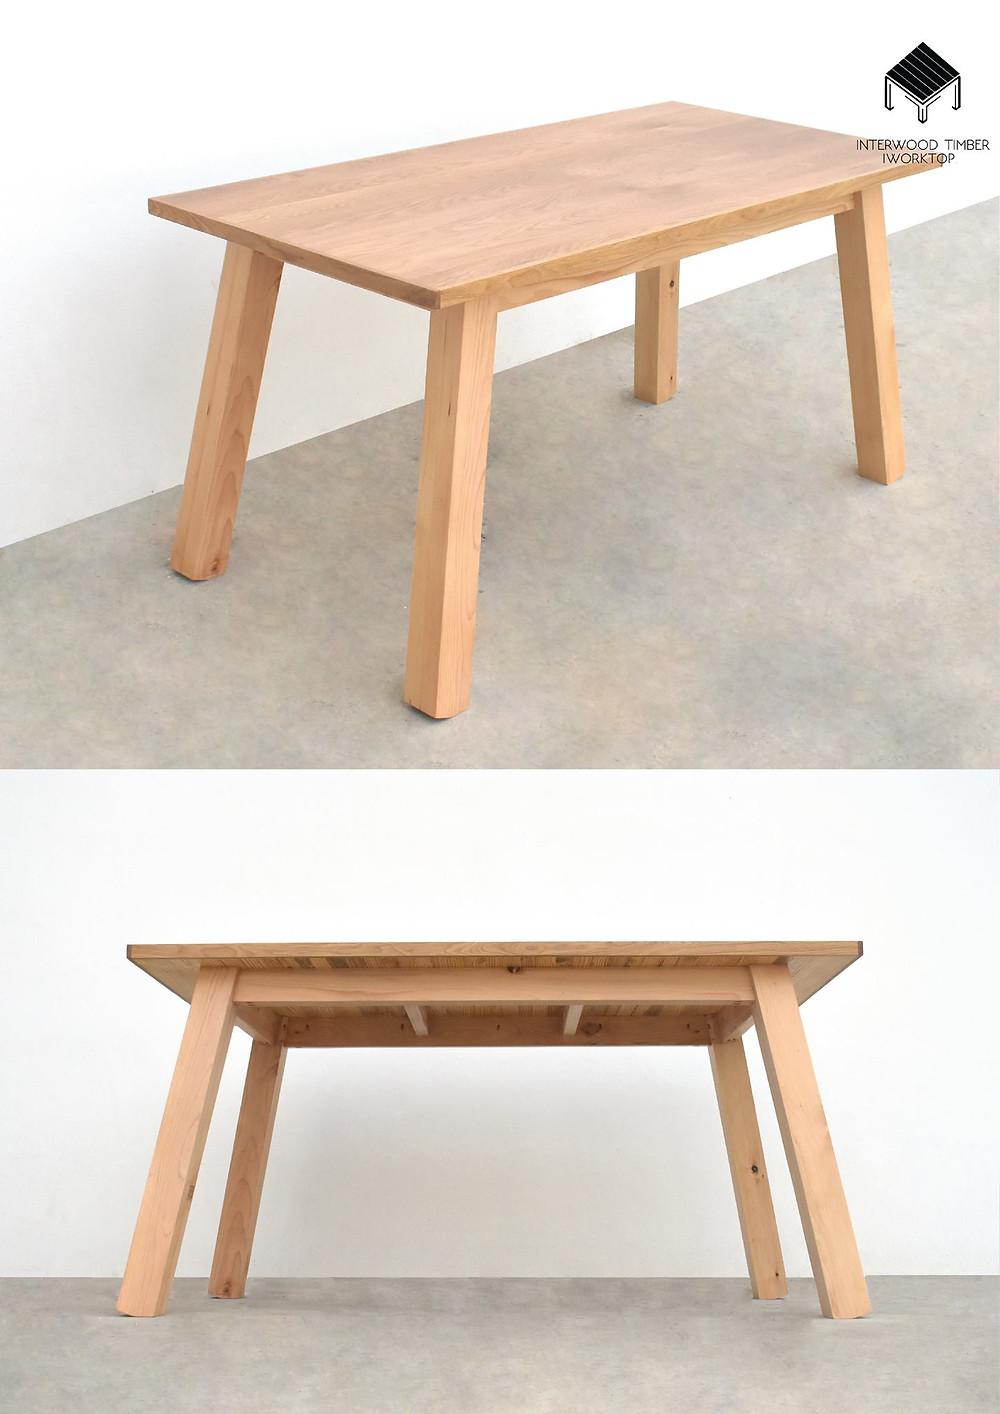 Interwood timber Glulam ไม้จริง - ประตู ลูกบันได โต๊ะ